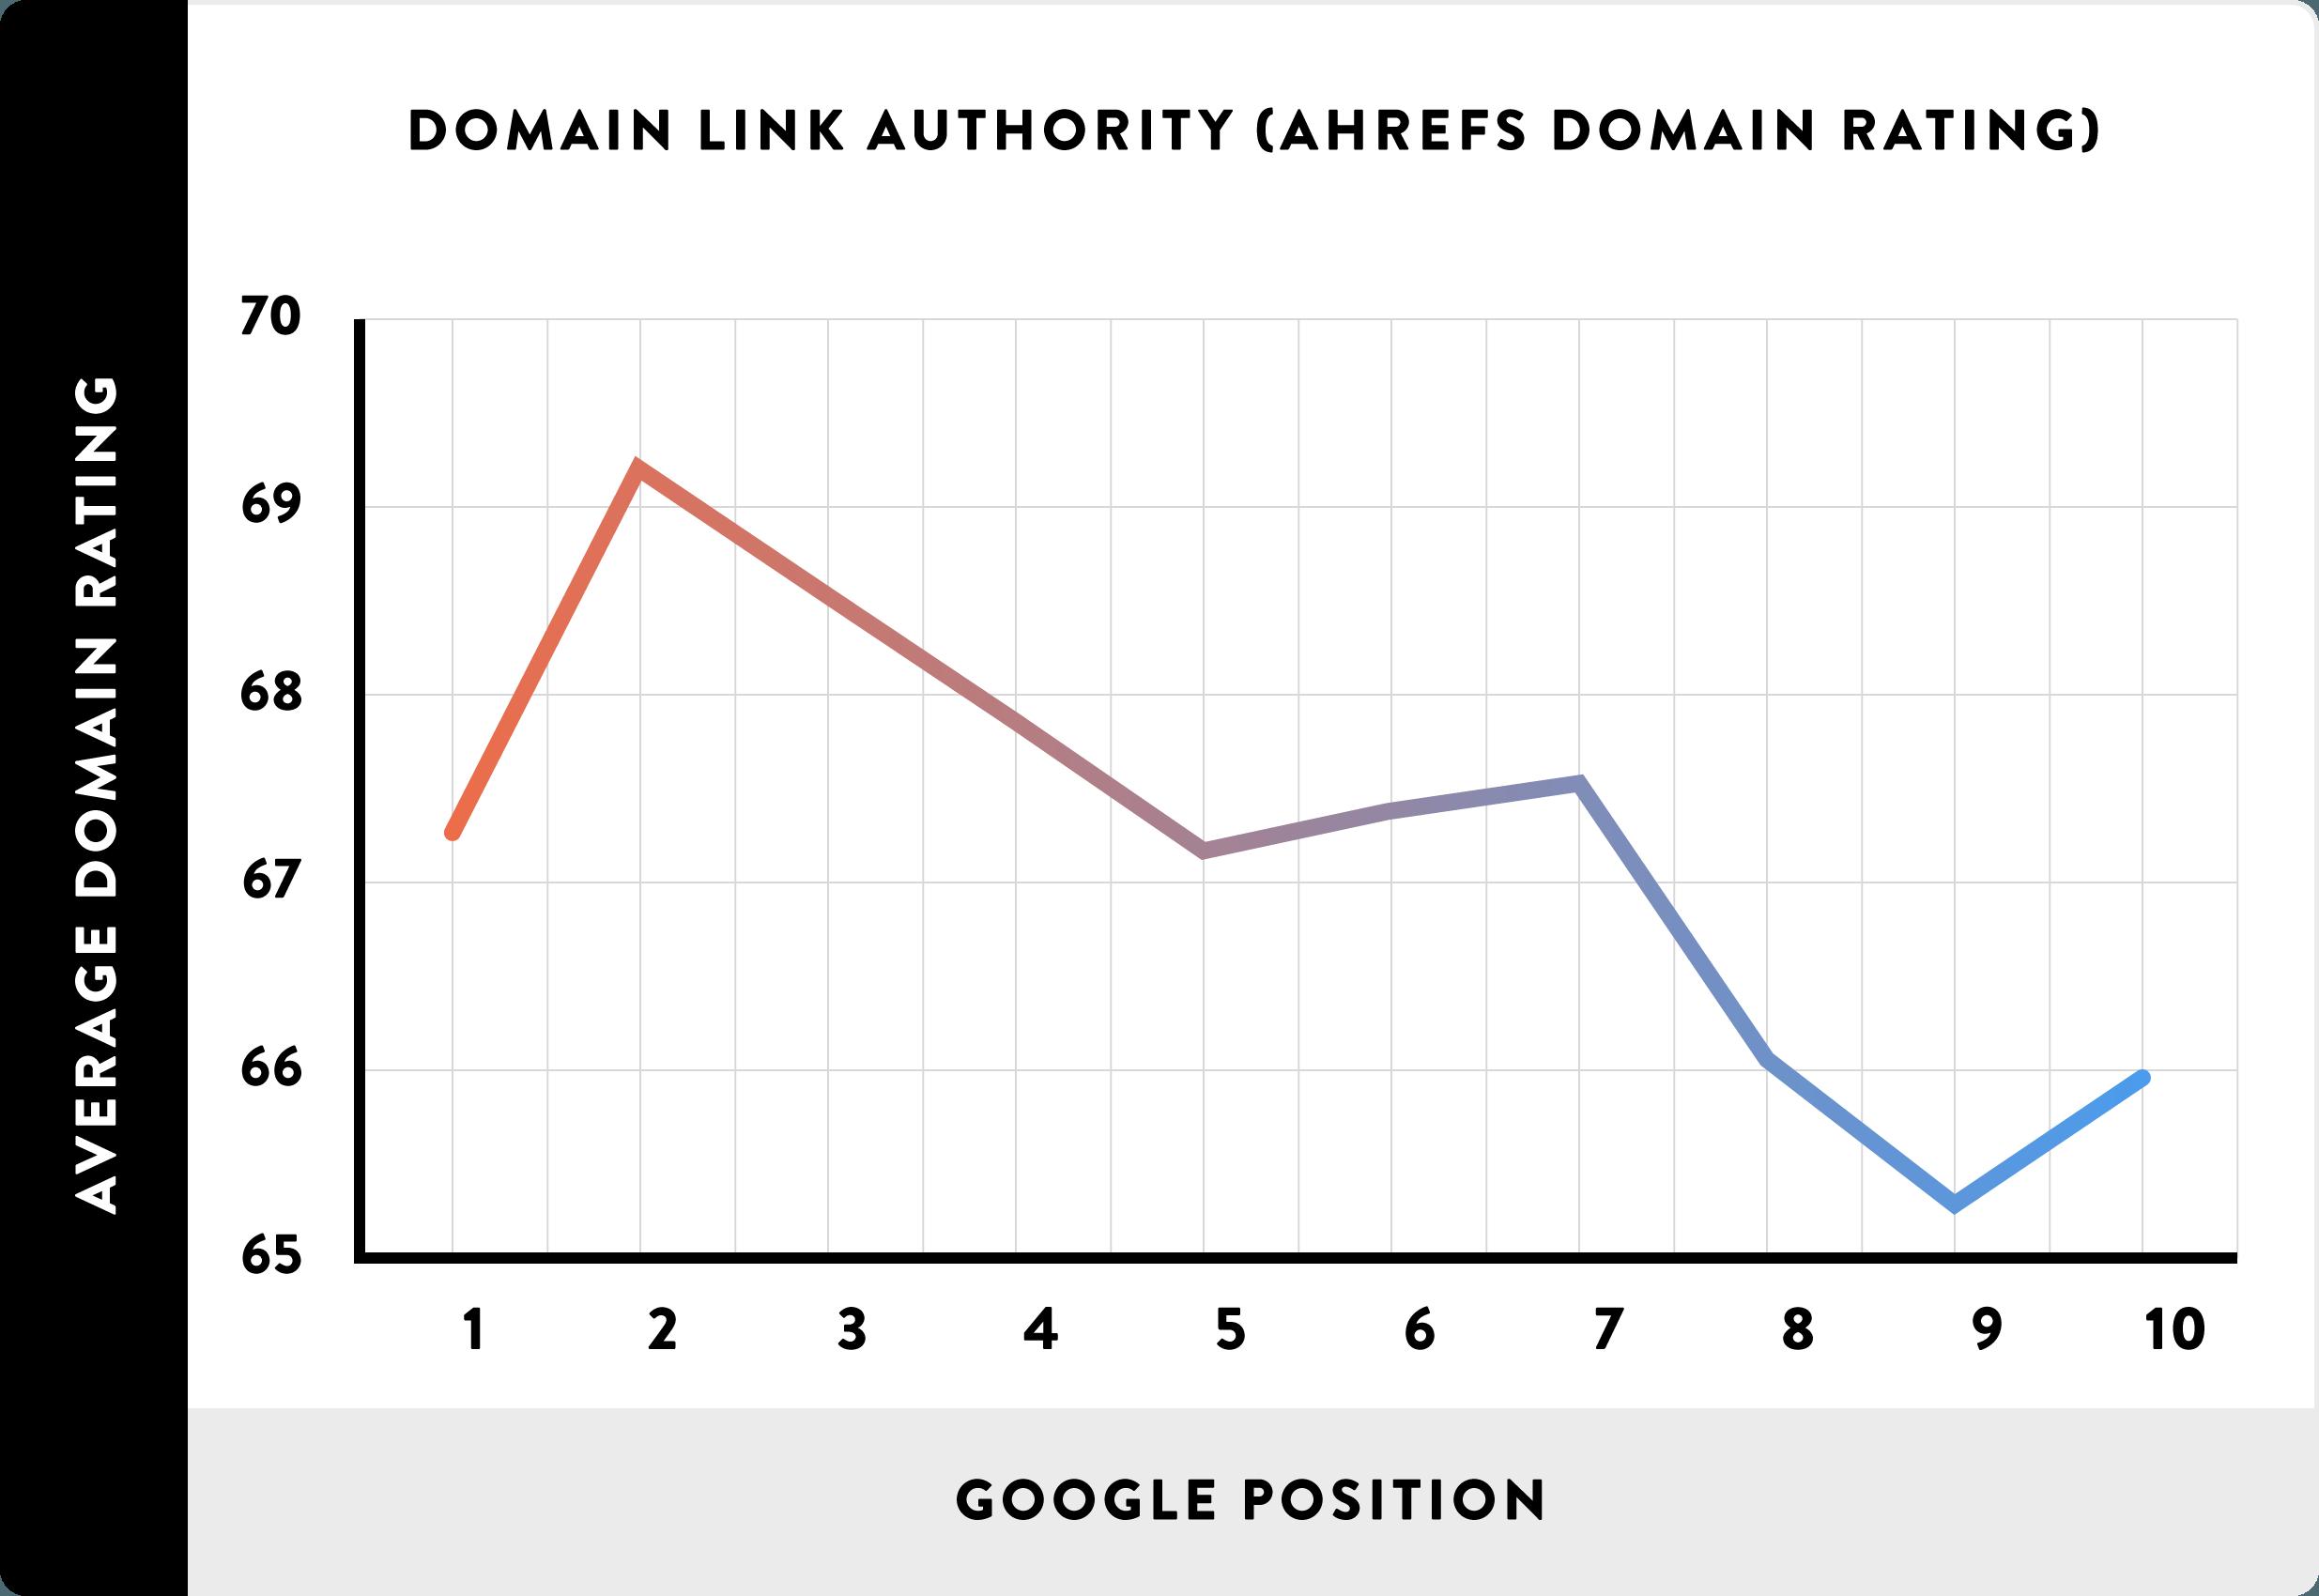 08_Domain Link Authority (AHREFs Domain Rating)_line